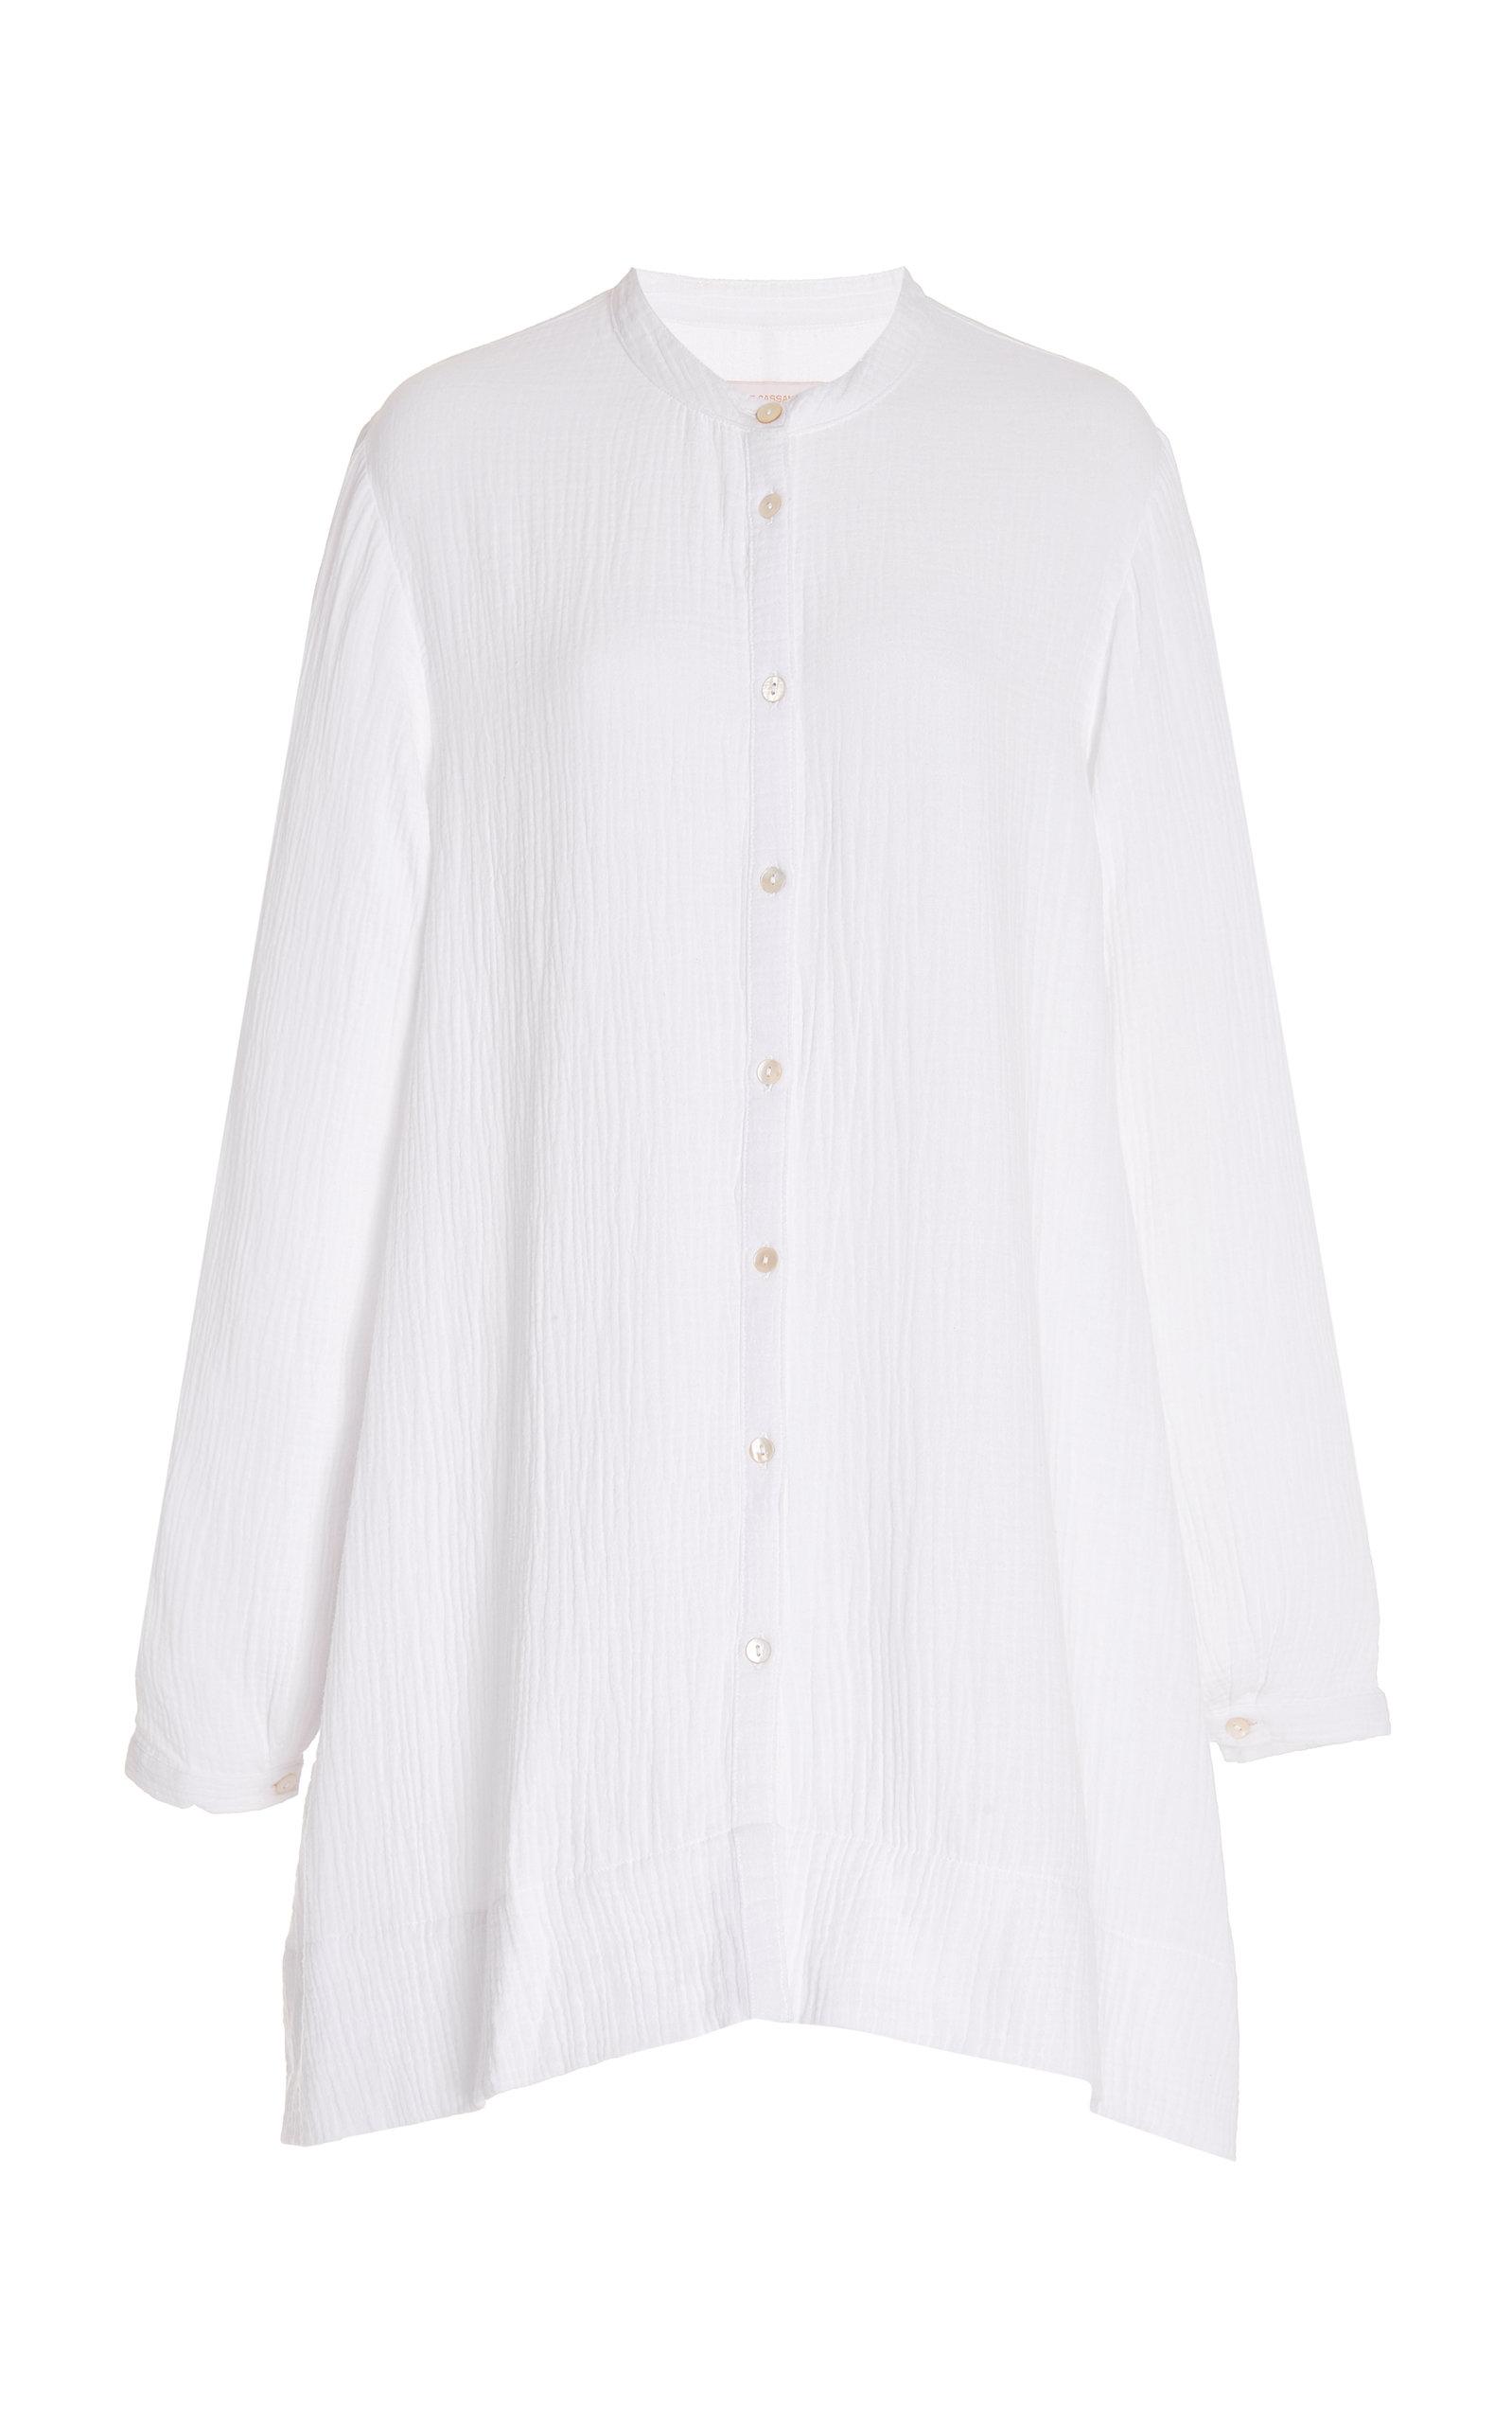 Women's Andrea Organic Cotton Top